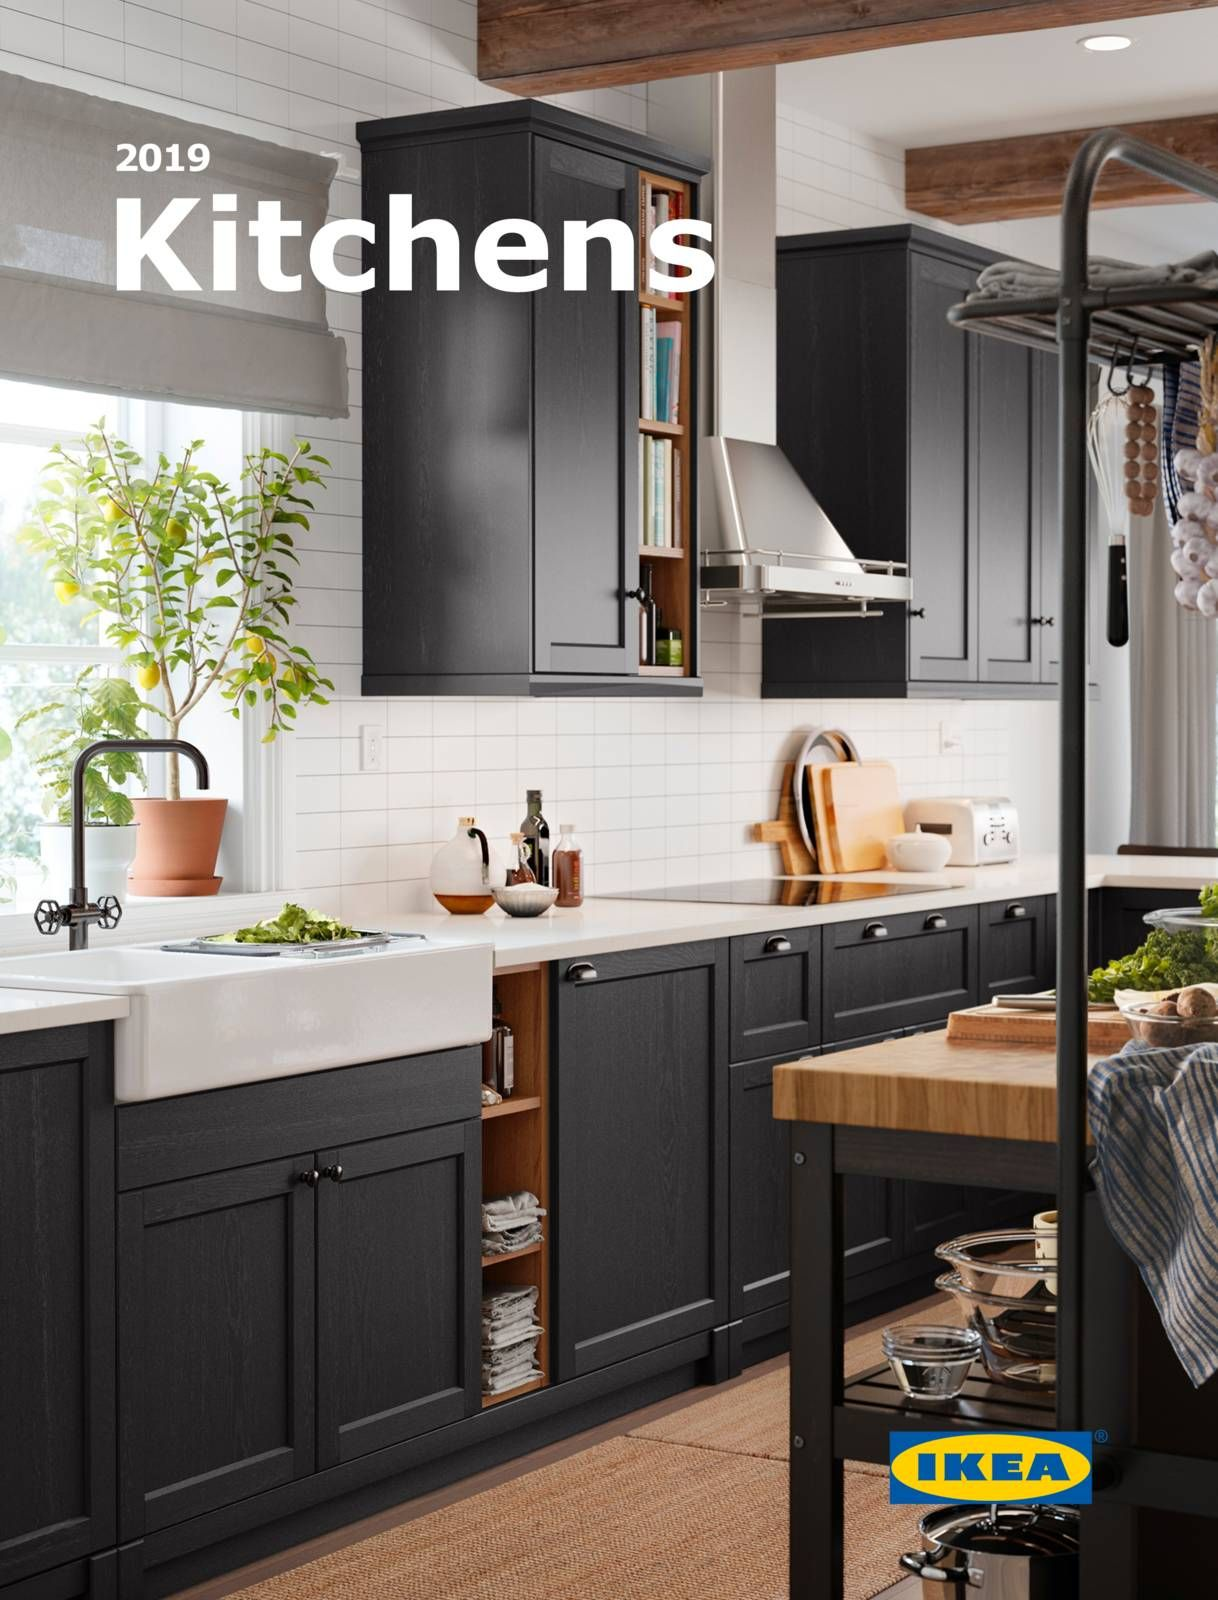 Kitchens 2019 Ikea Kitchen Brochure 2019 Black Ikea Kitchen Ikea Kitchen Design Kitchen Trends